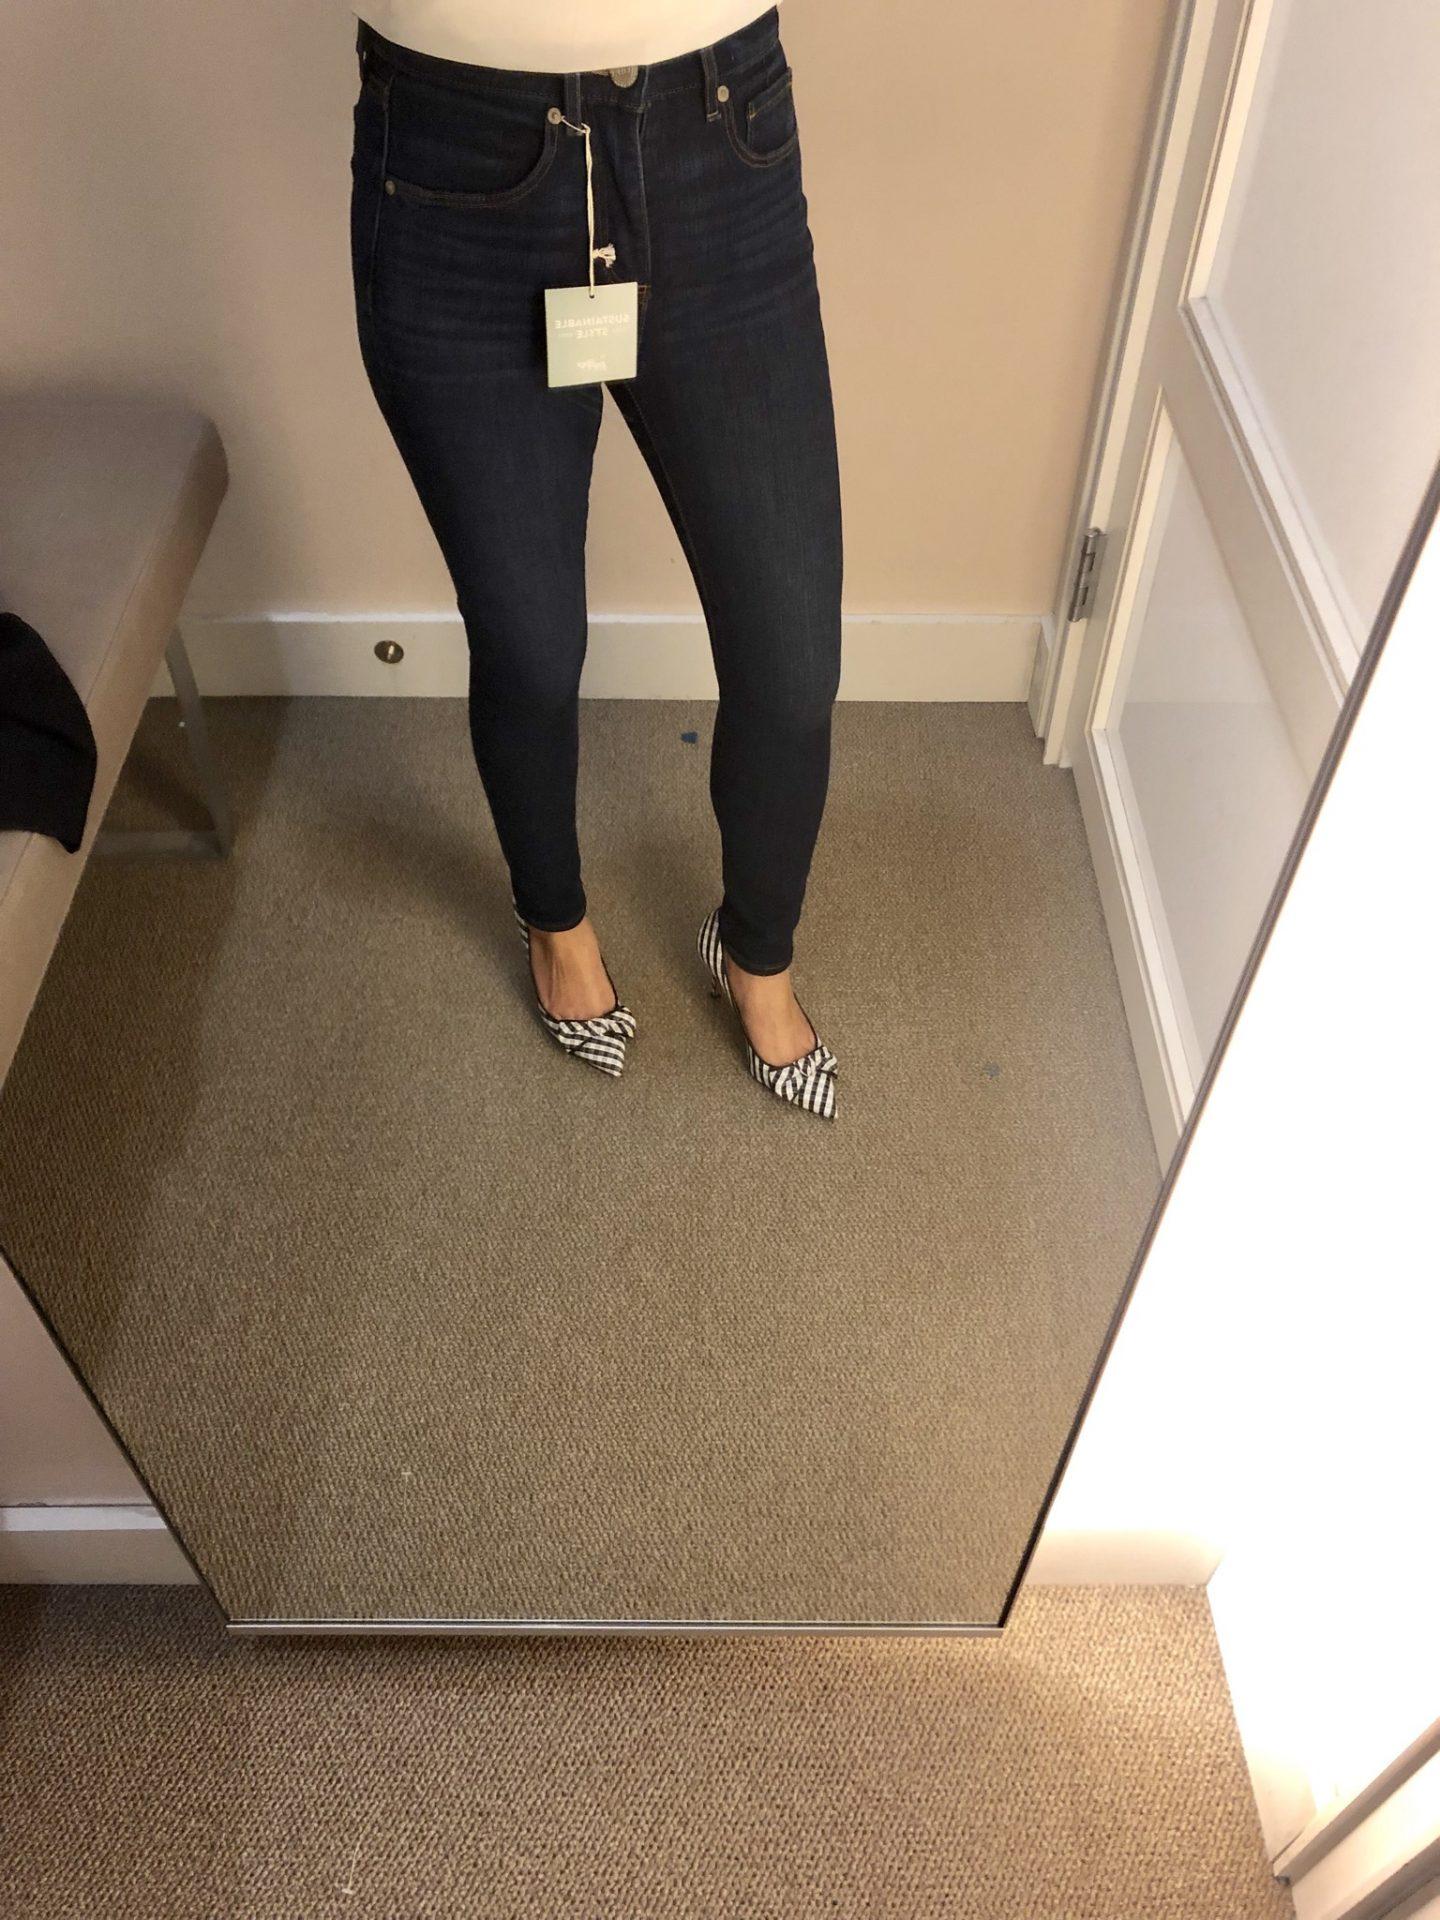 LOFT Slim Pocket High Rise Skinny Jeans in Vintage Dark Indigo Wash, size 25/0P